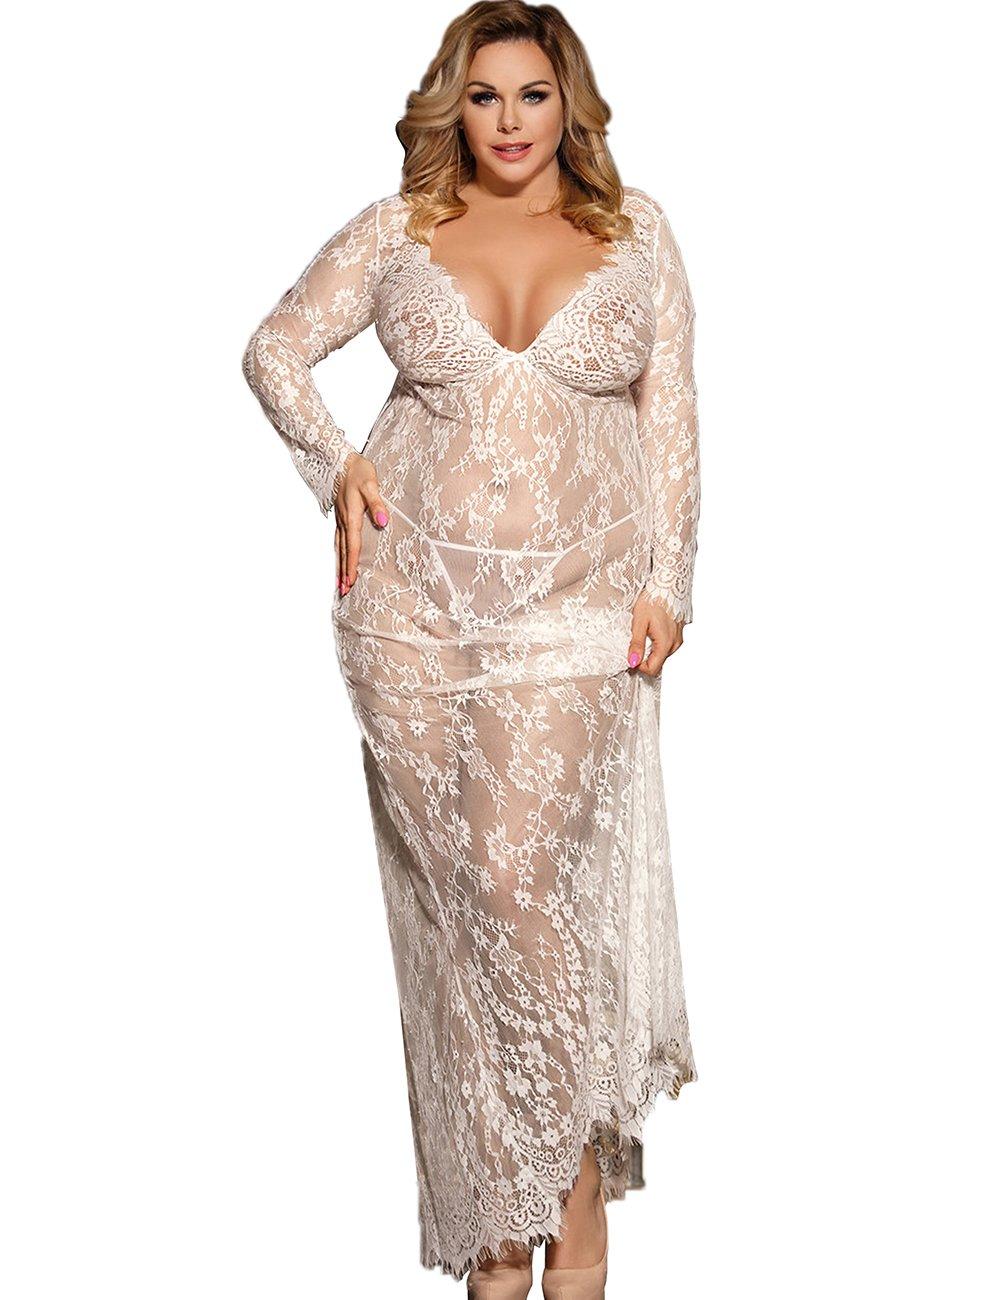 Dean Fast Women Plus Size Floral Lace Nightgown Long Lingerie Sleepwear Chemise White XXXL